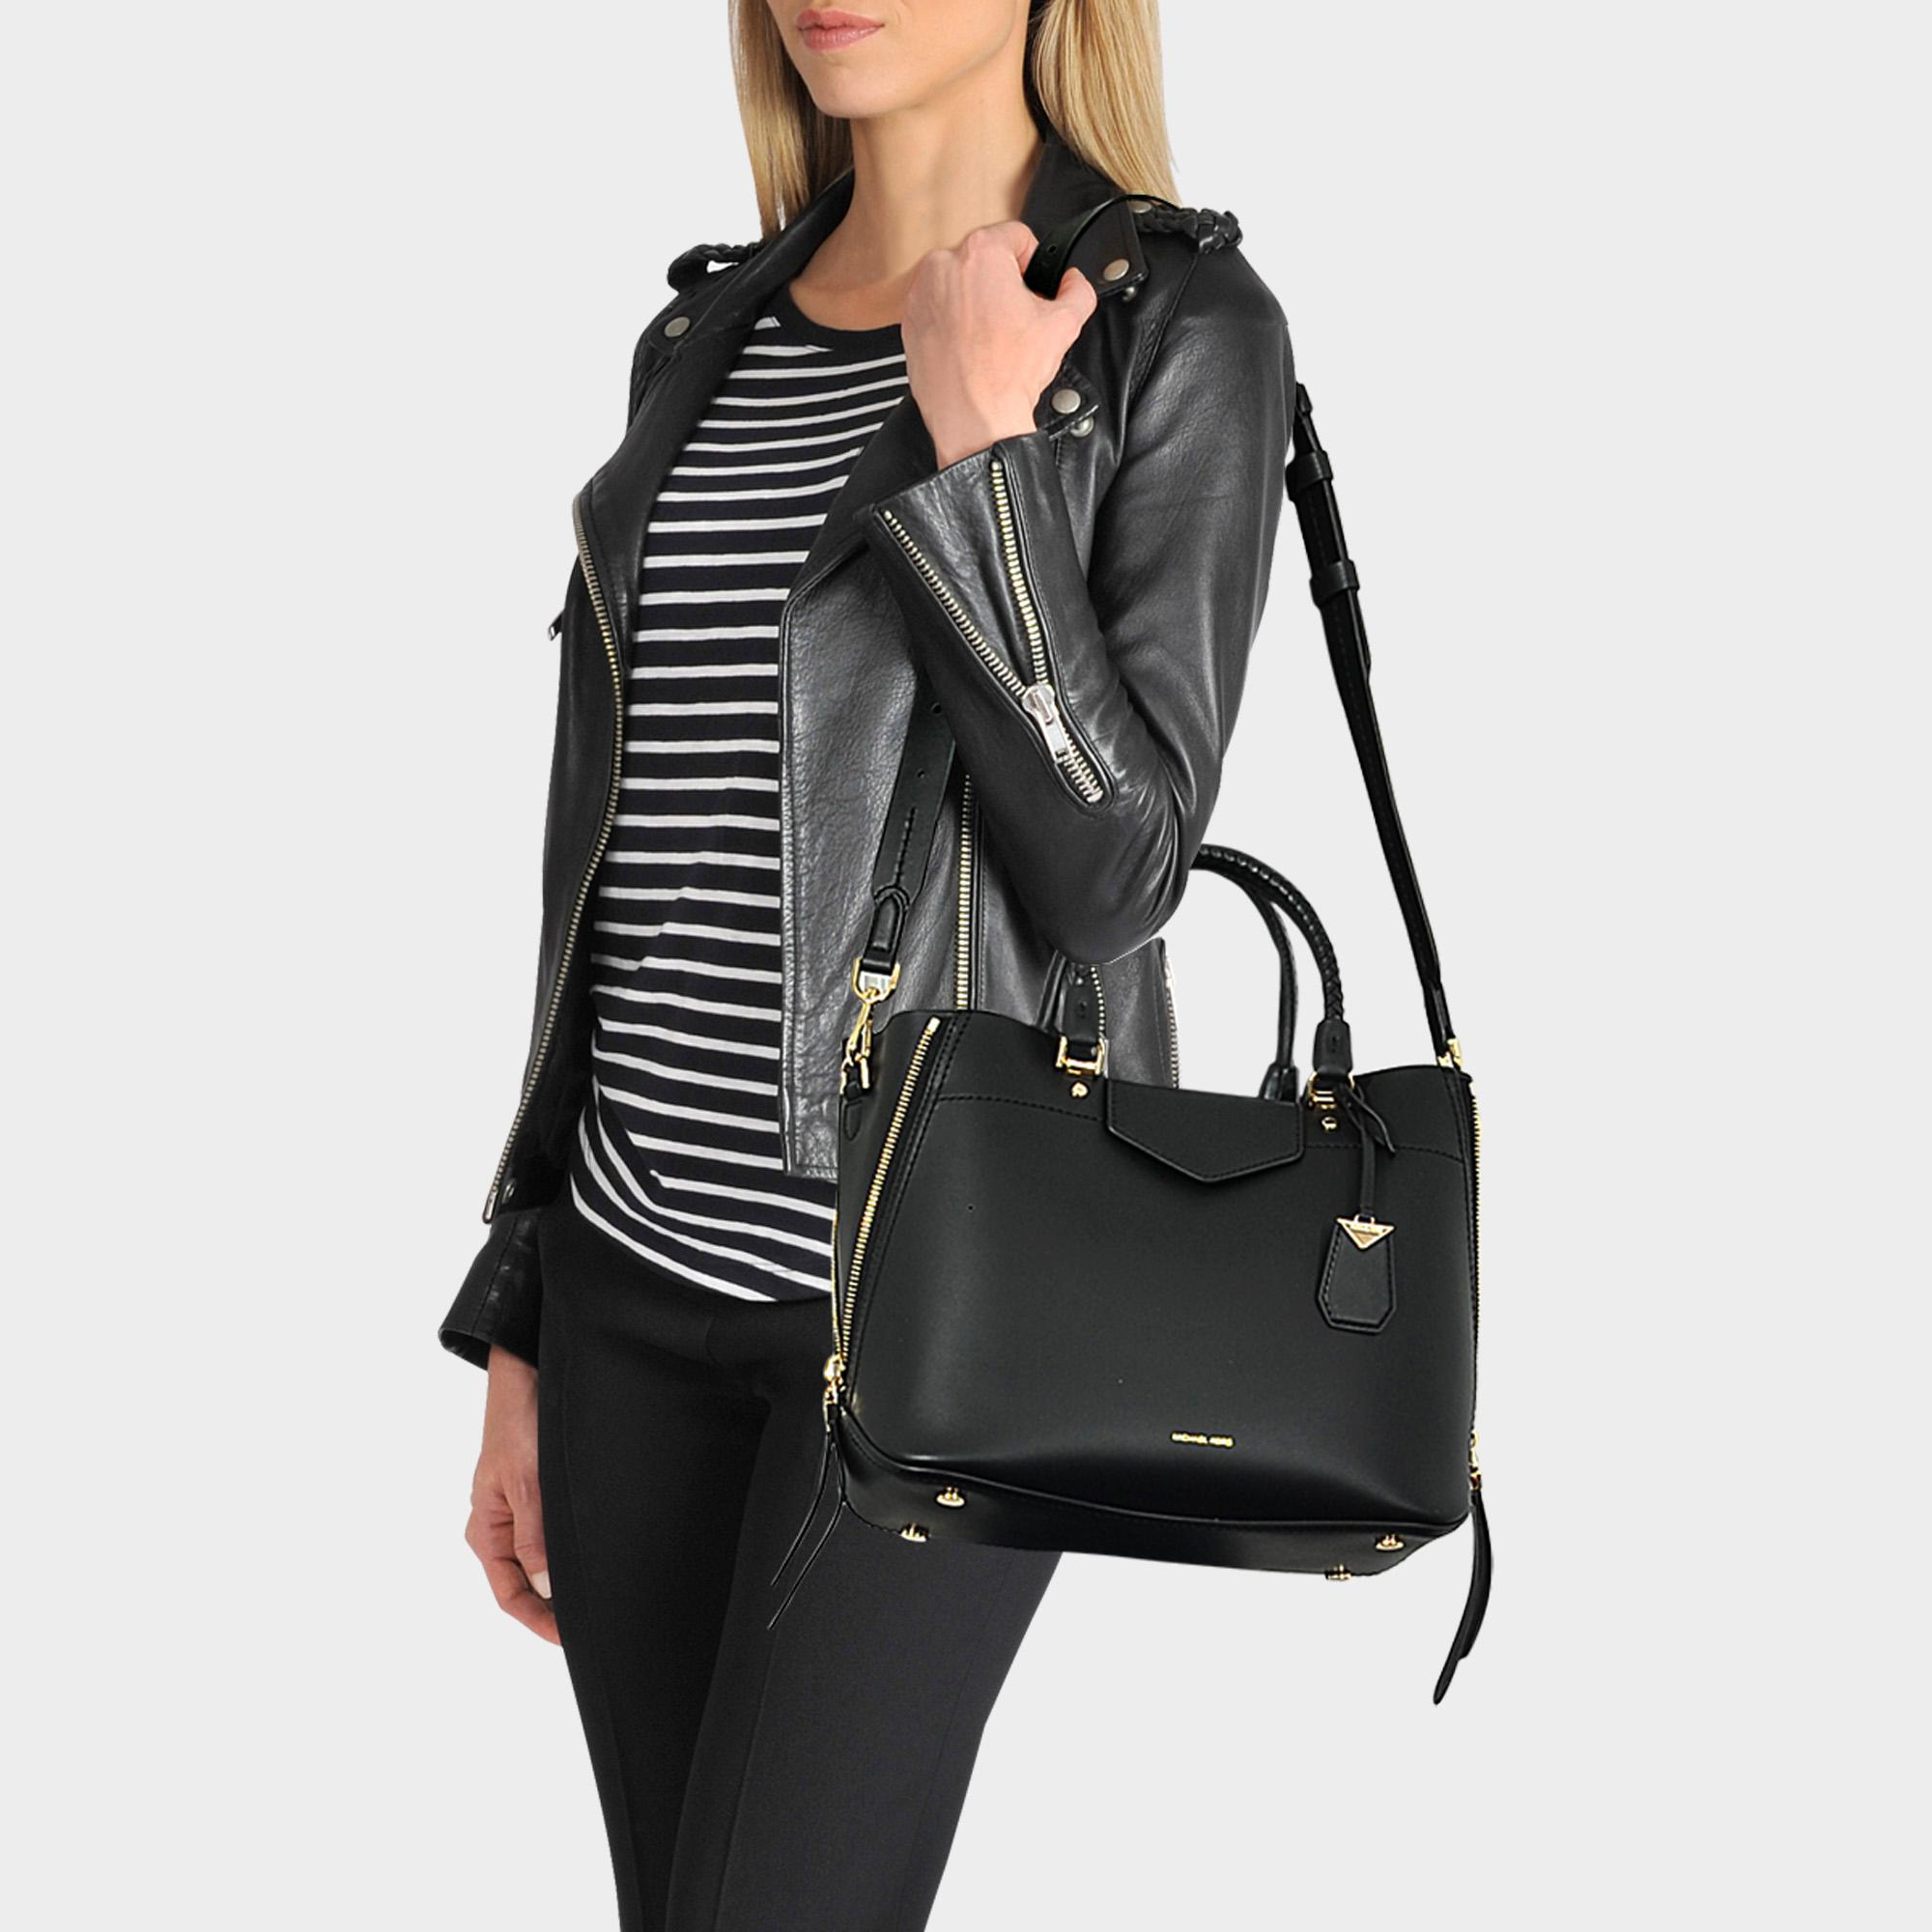 039e7503019e MICHAEL Michael Kors Blakely Medium Tote Bag In Black Viola Leather ...